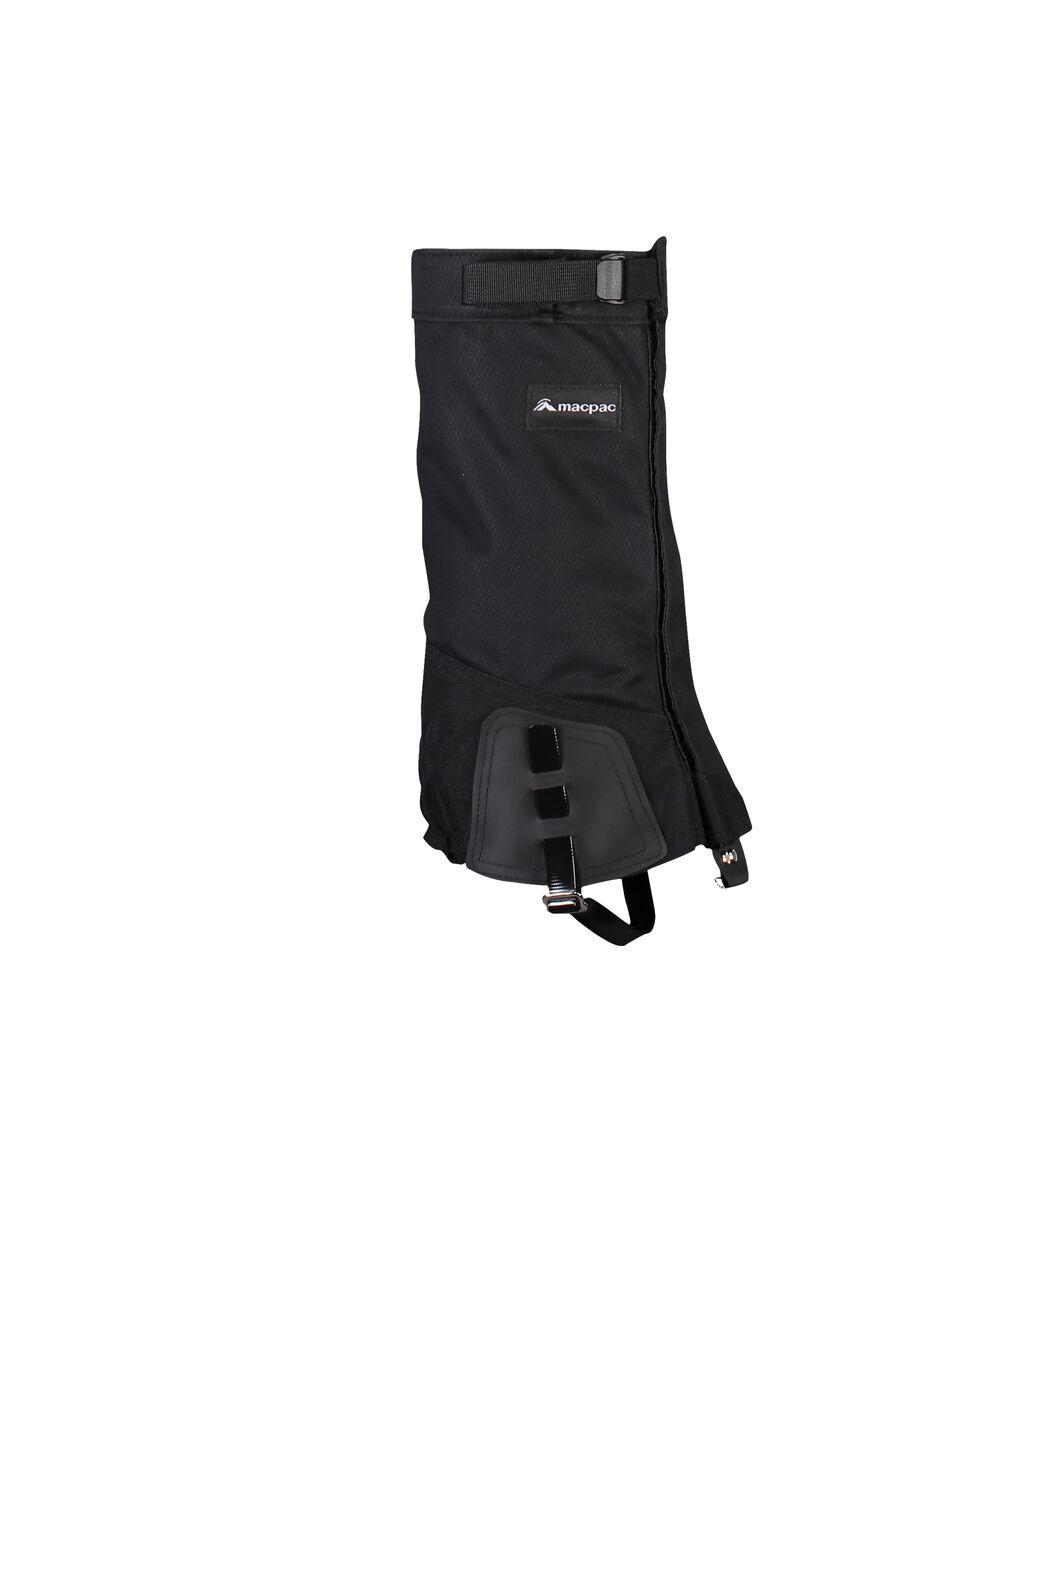 Macpac Cascade Gaiters V2, Black, hi-res